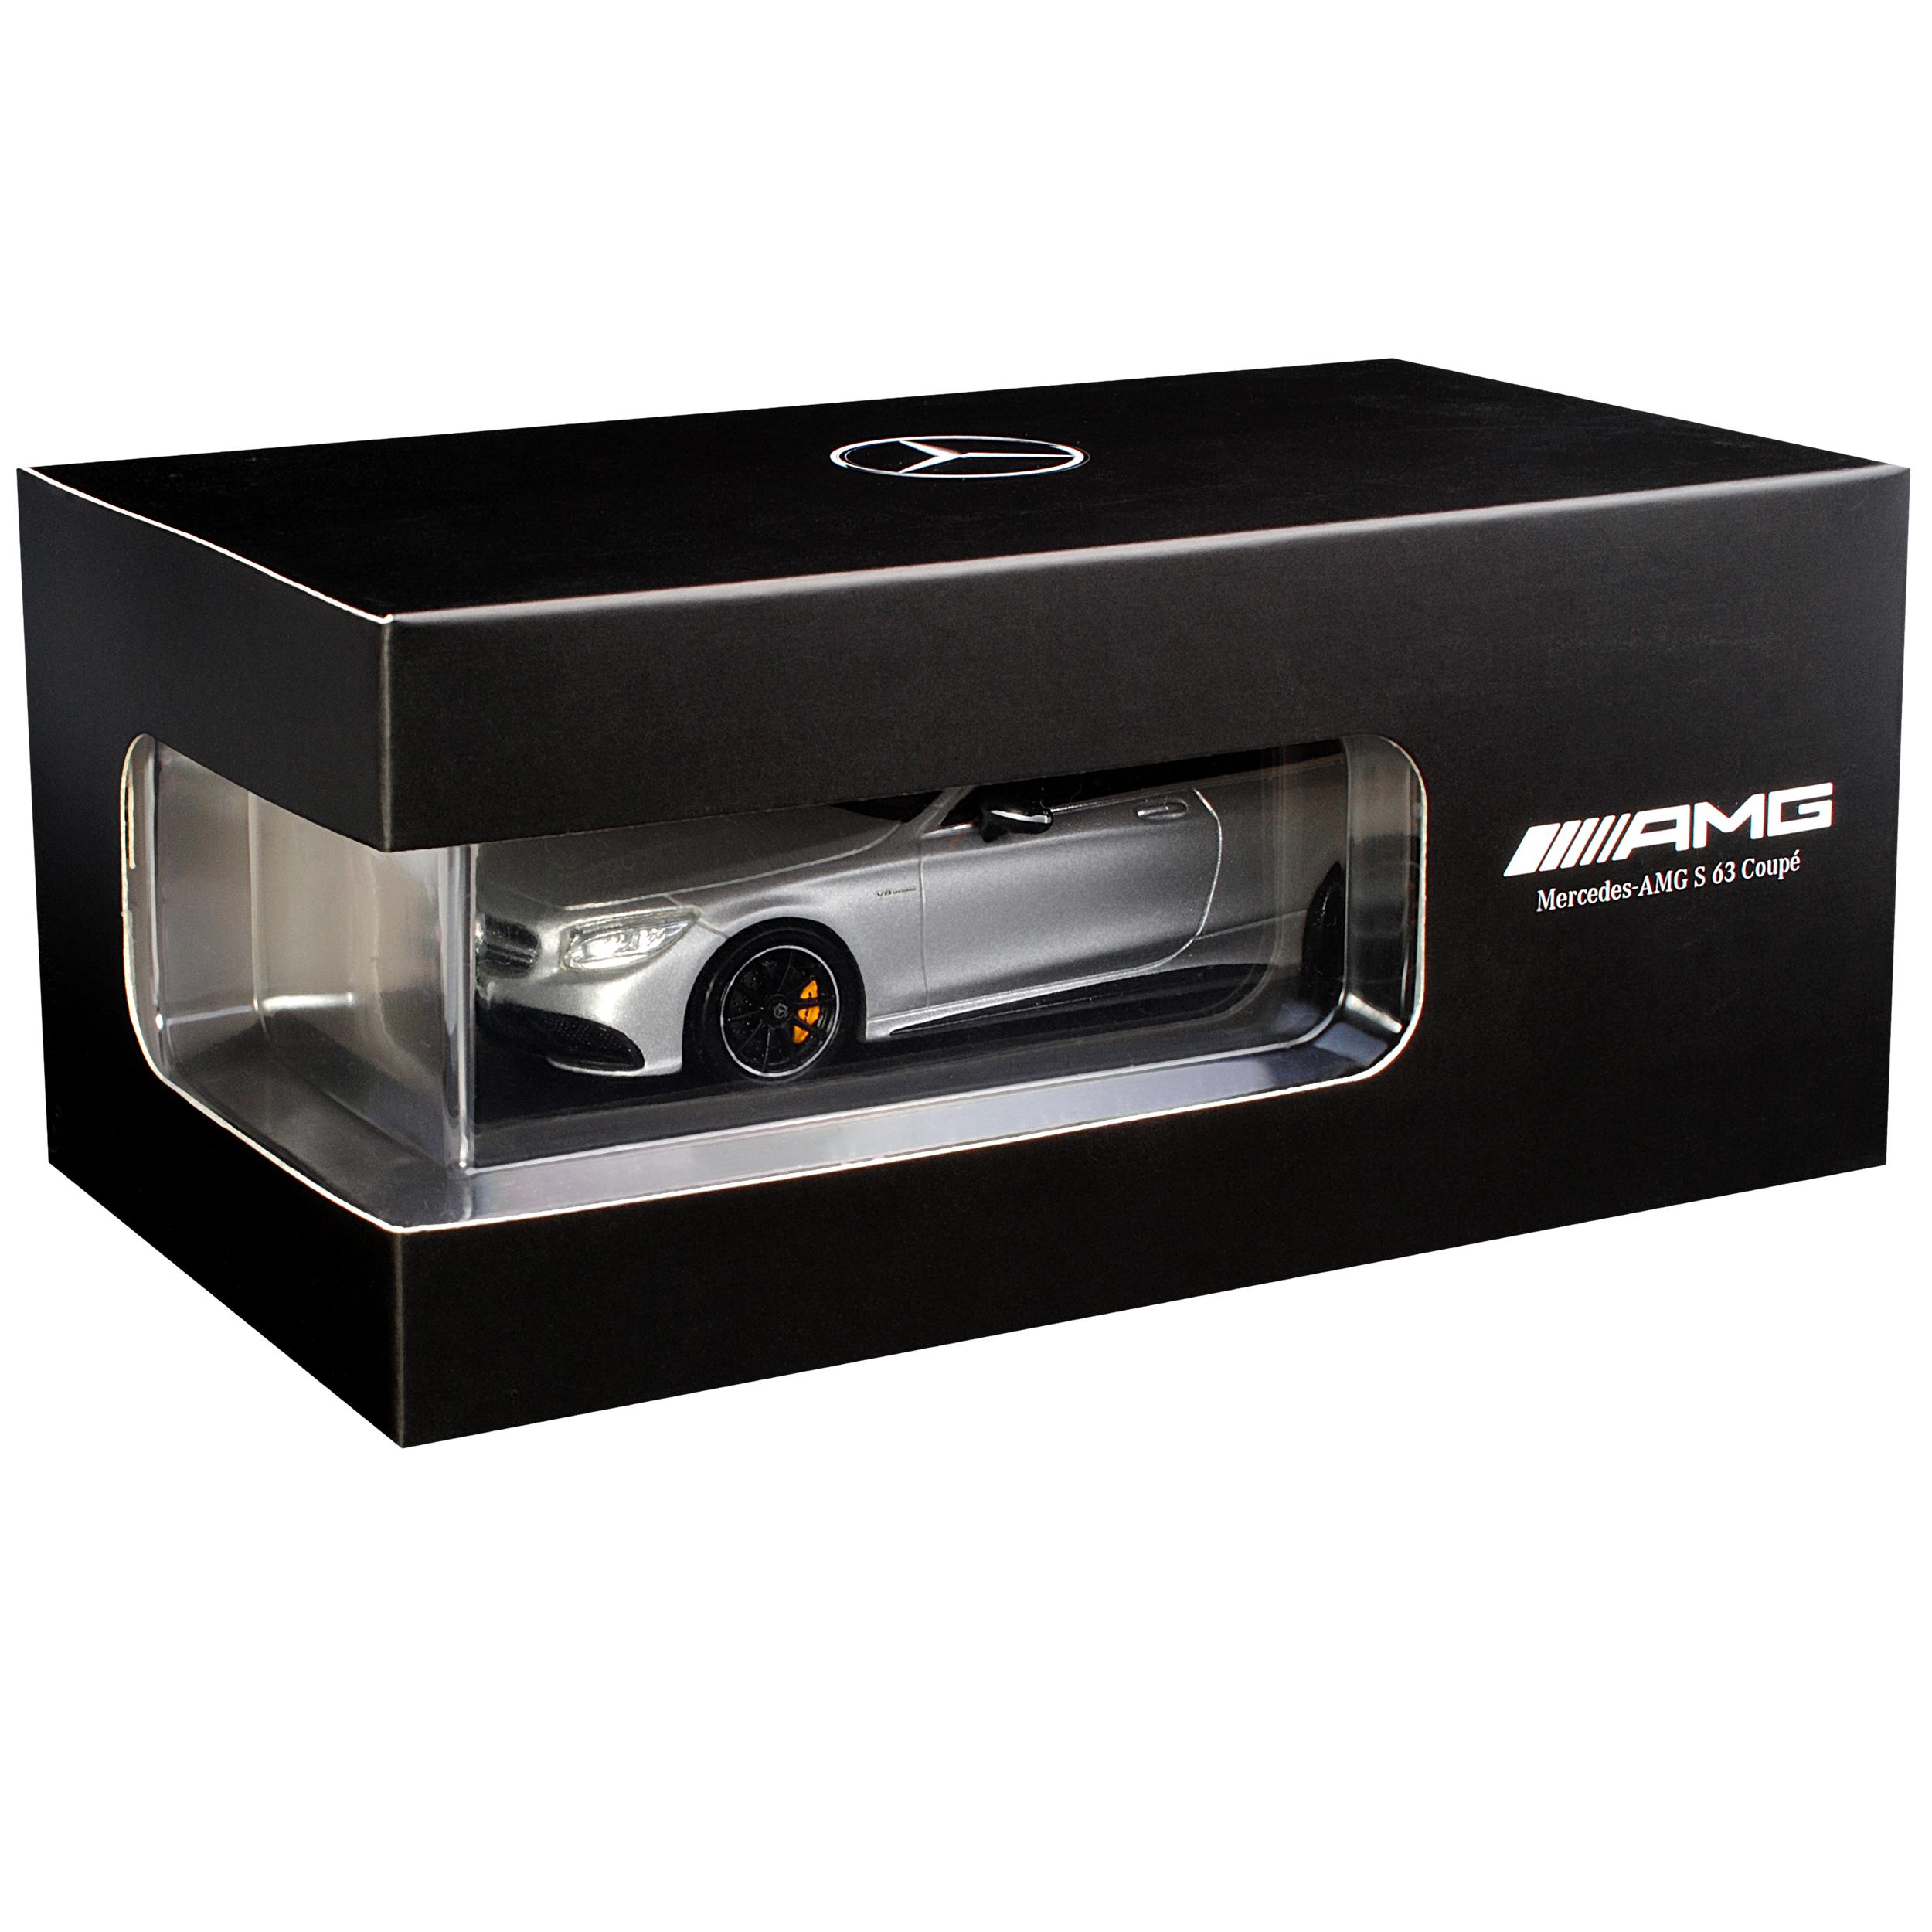 Mercedes-Benz Clase S S63 AMG Coupe C217 Iridium plata Magno Magno Magno de 2014 1 43 SP... d05d62